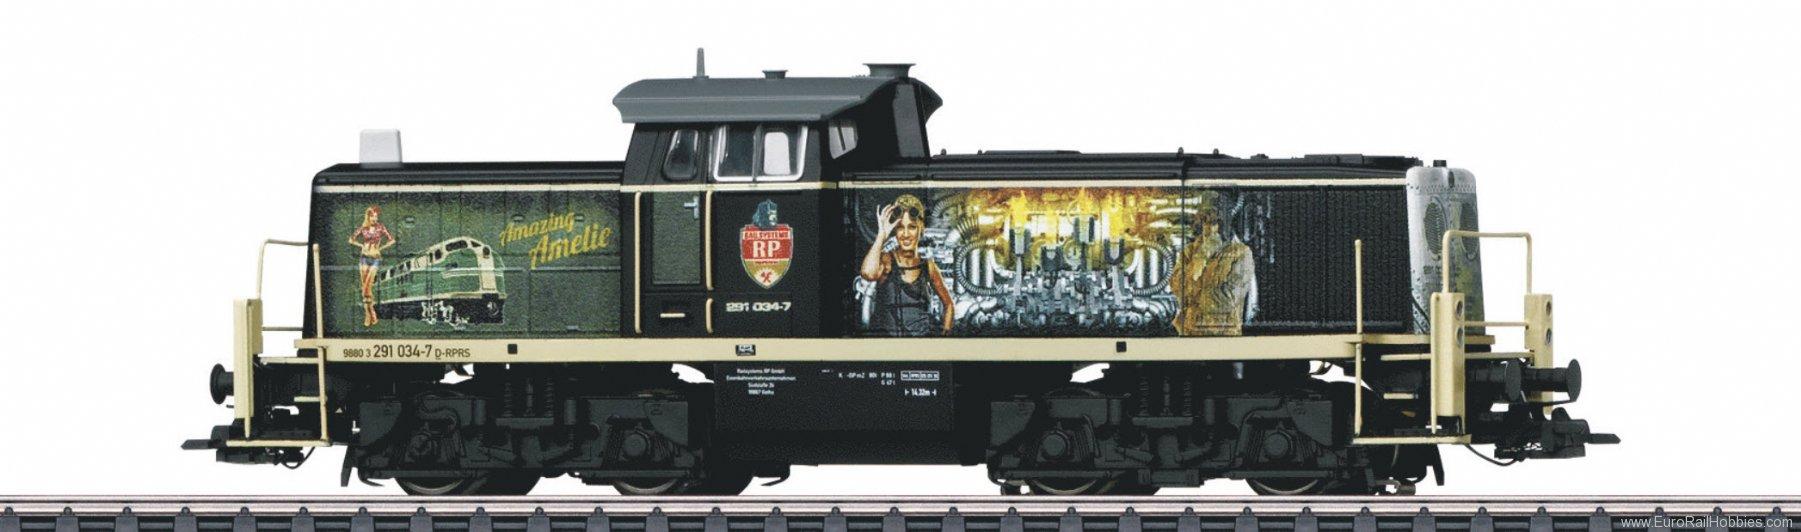 New EuroTrain/Idee & Speil Marklin Special Edition - HO BR291 'Amazing Amelie'